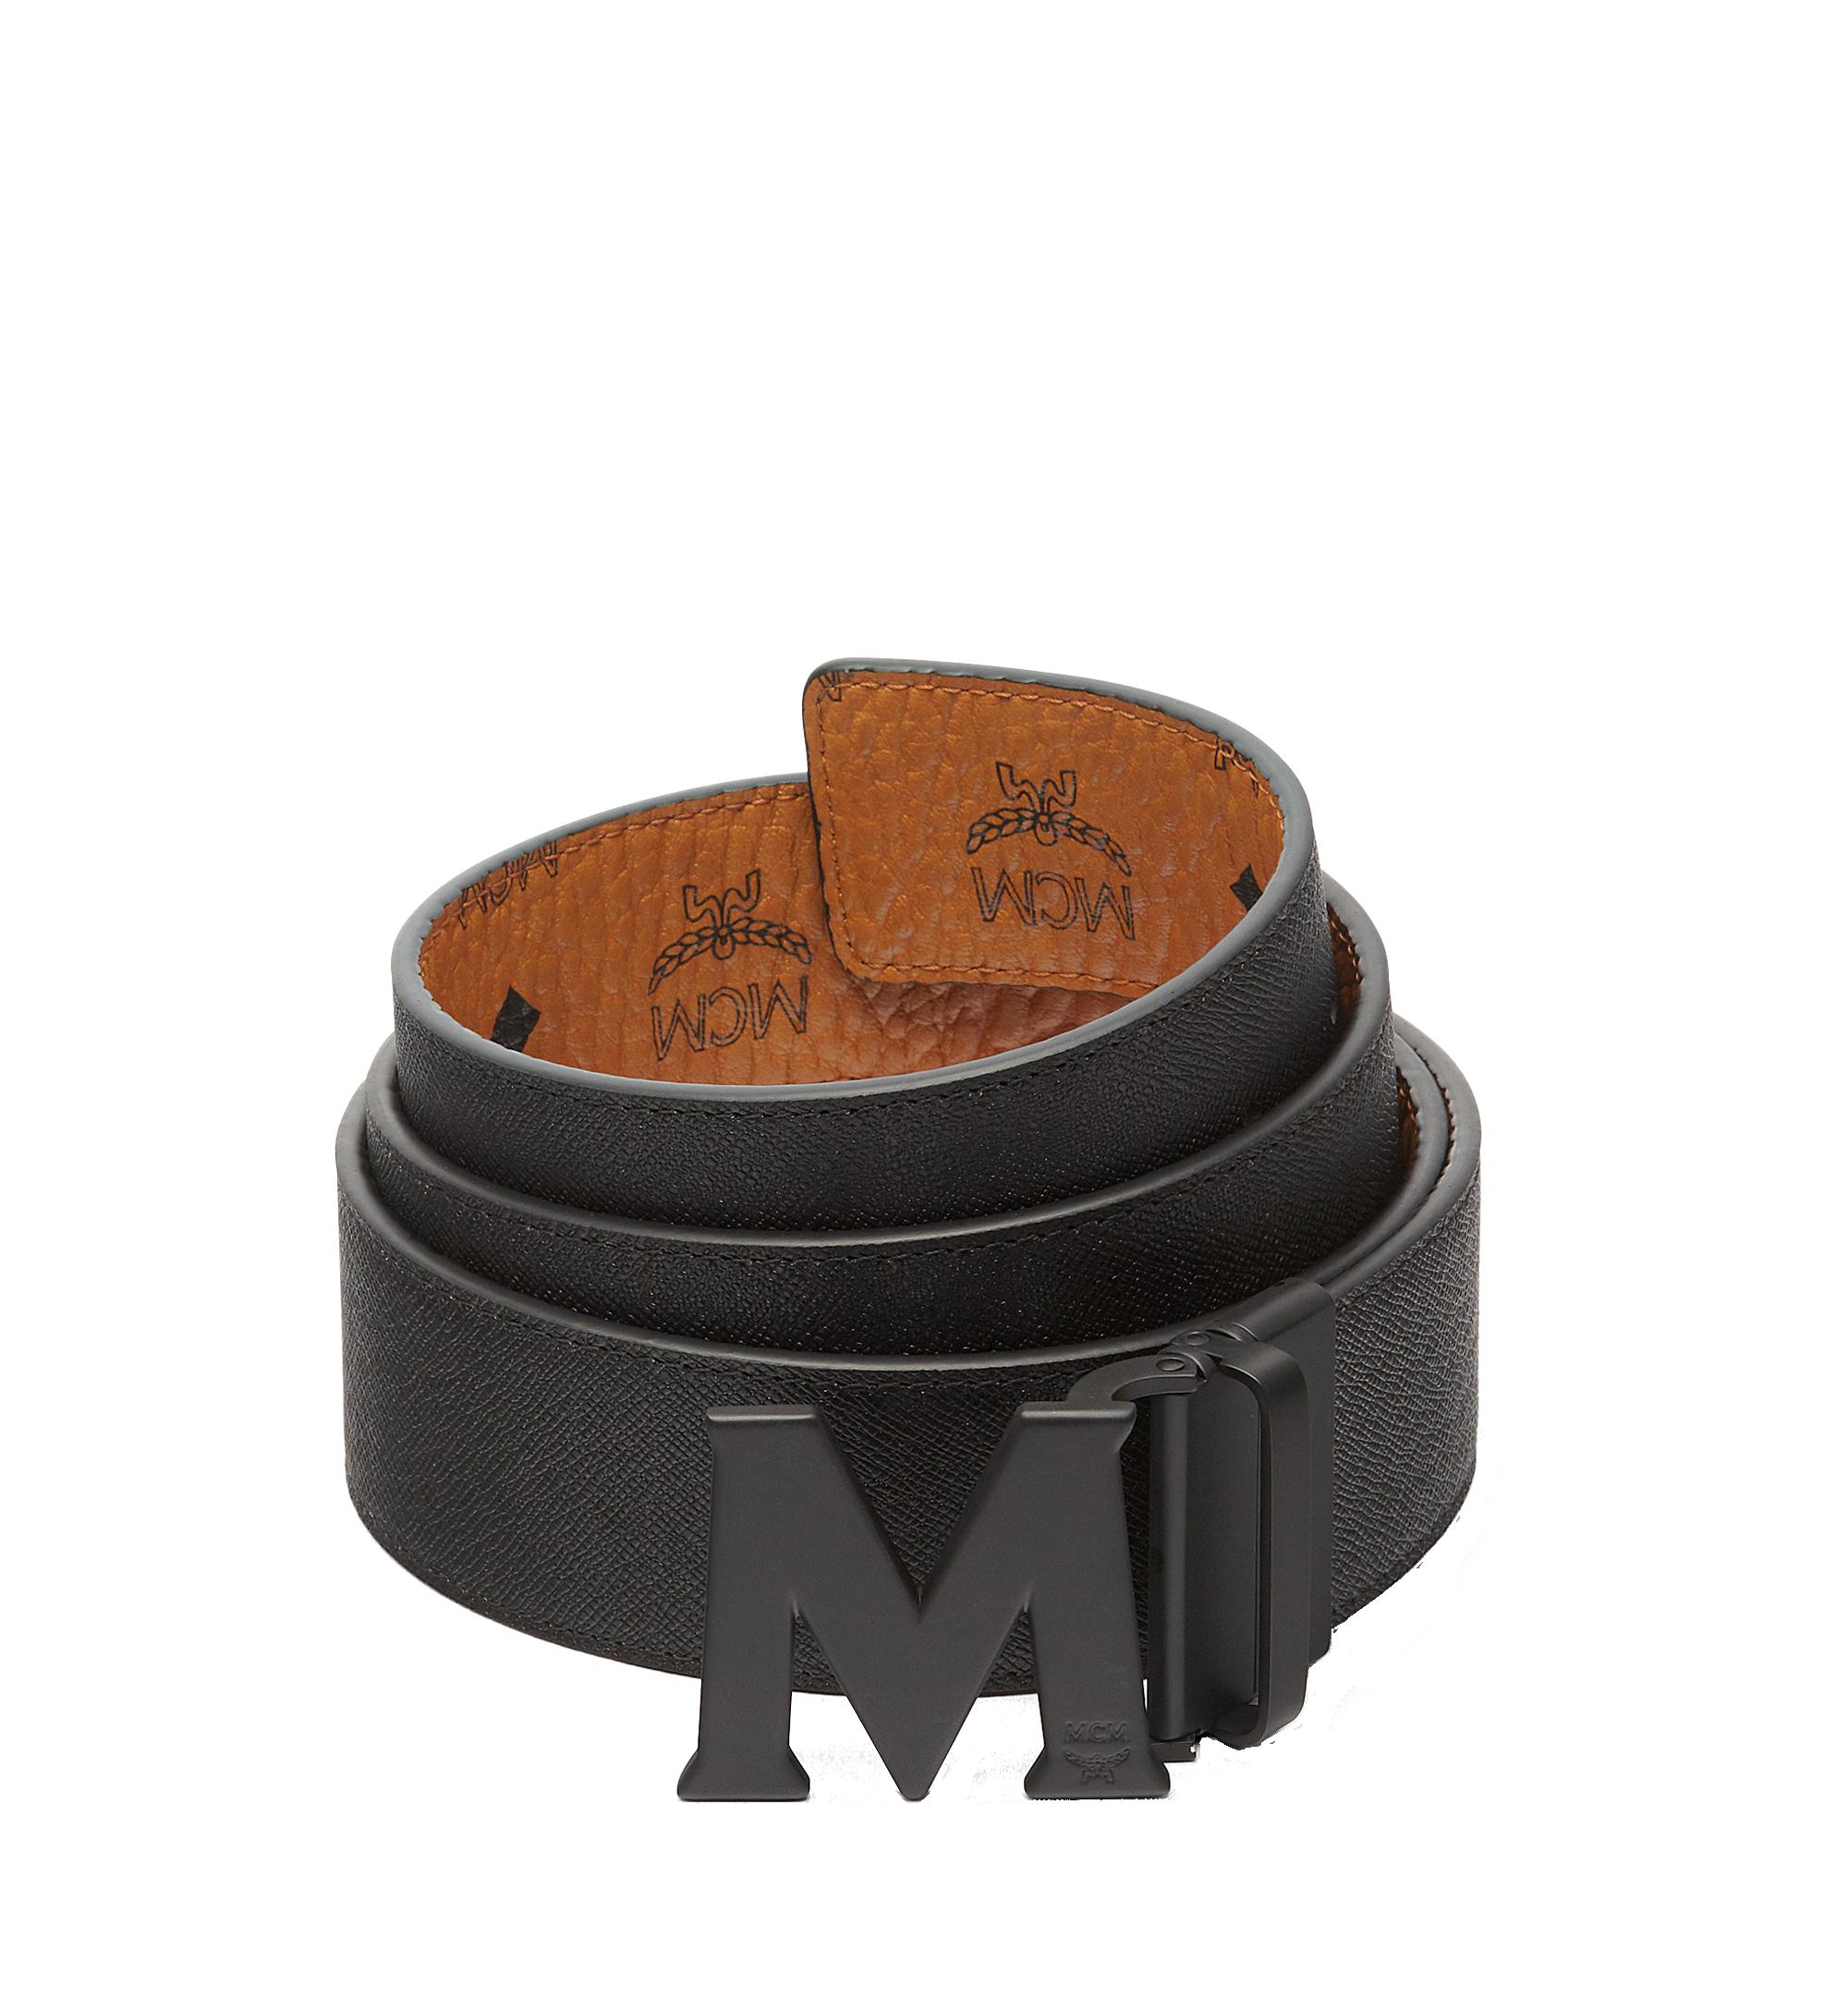 "MCM Flat M Reversible Belt 1.75"" in Visetos Cognac MXB7SVI10CO001 Alternate View 2"